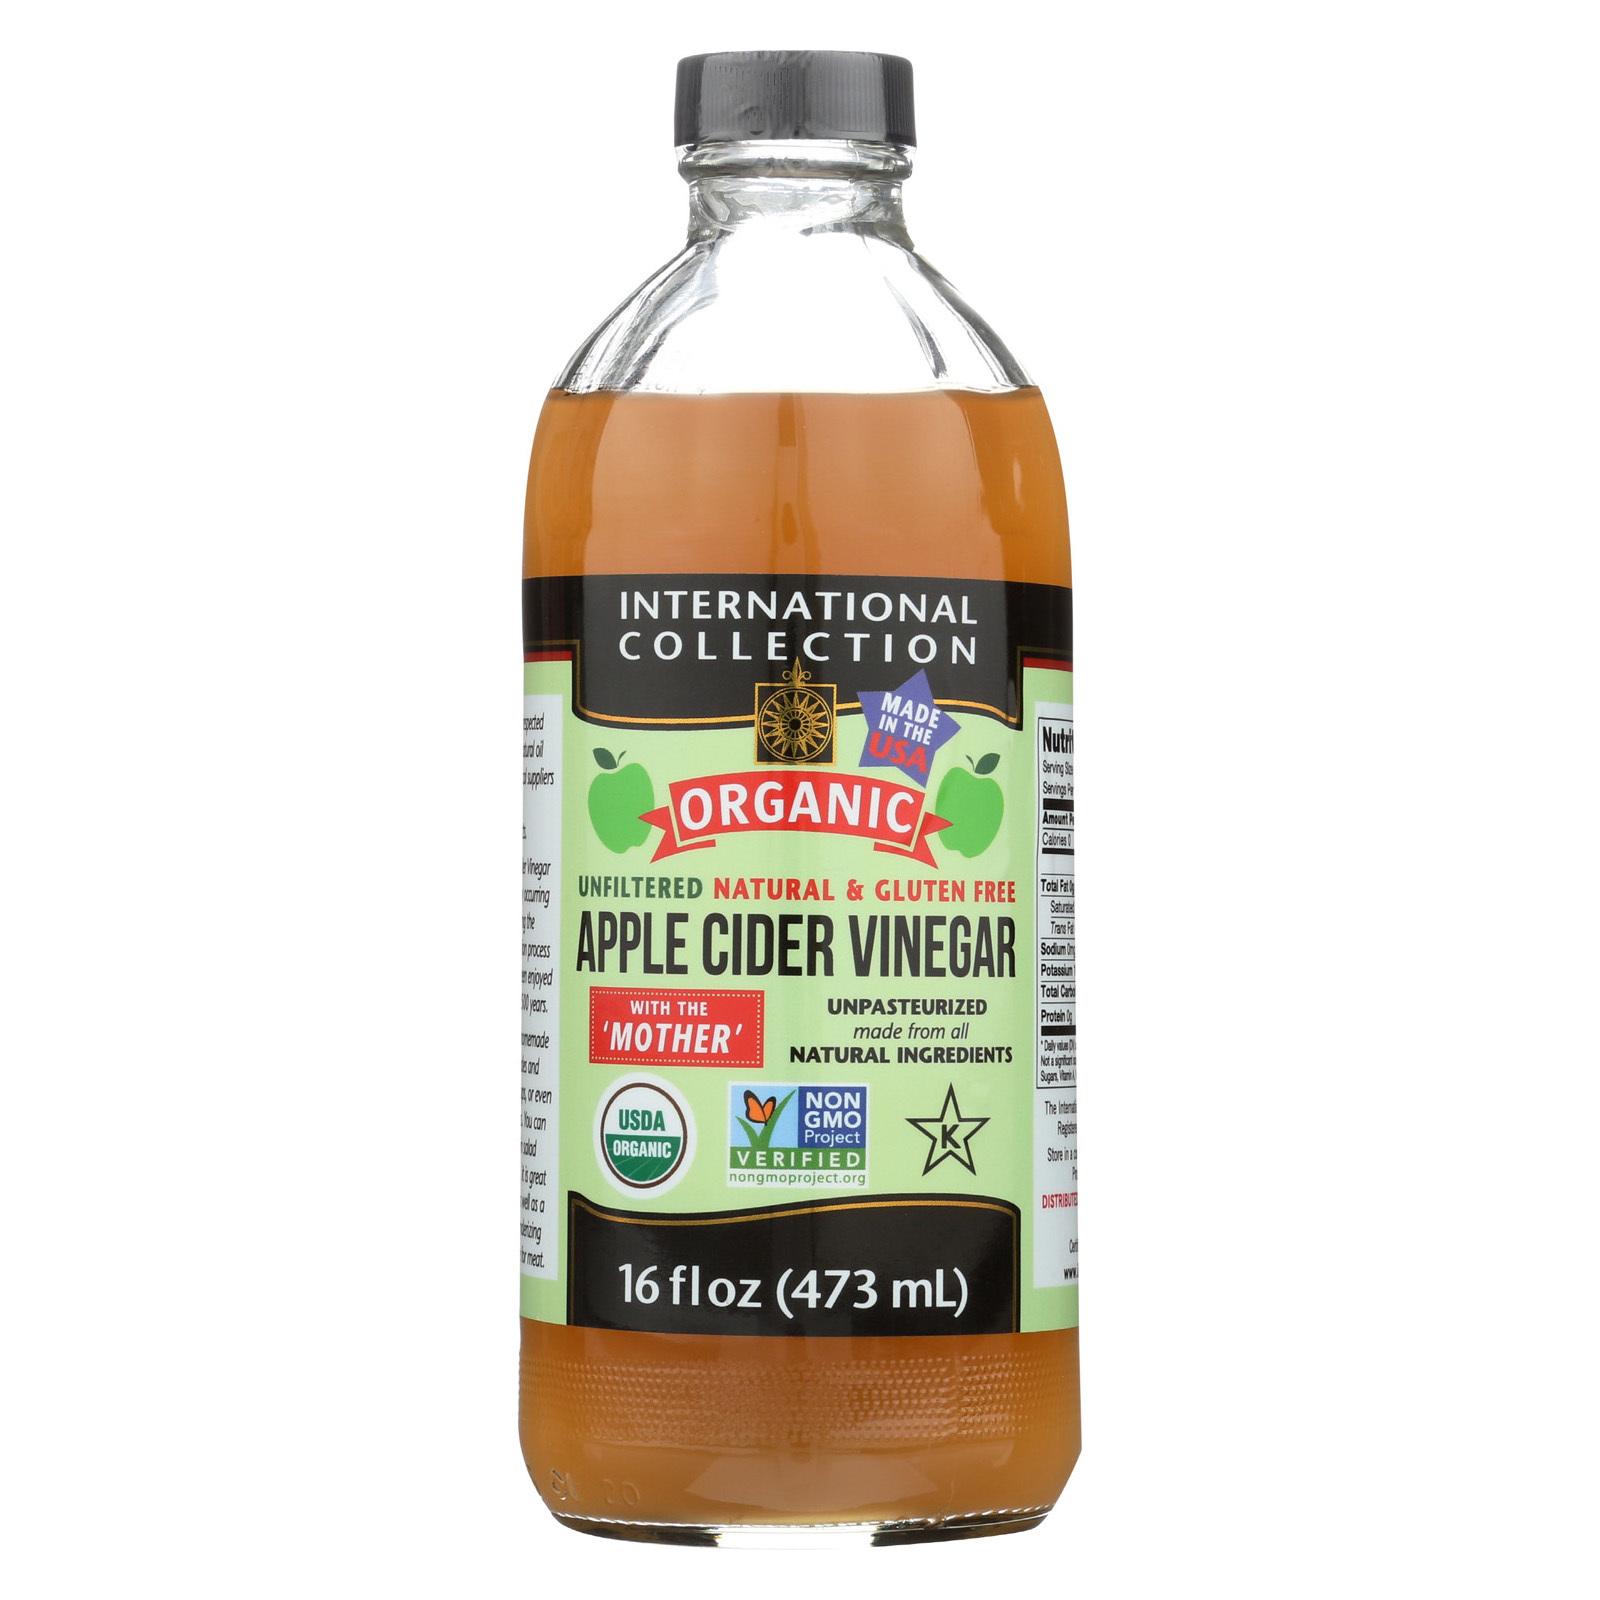 International Collection Organic Vinegar - Apple Cider - Case of 6 - 16 fl oz